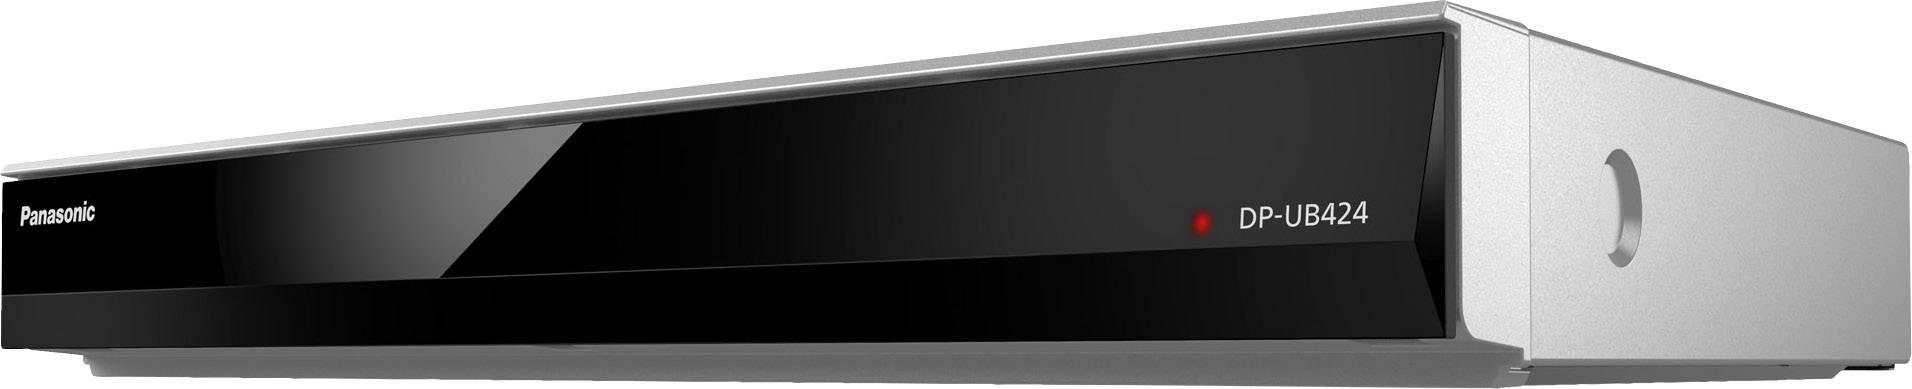 UHD Blu-Ray přehrávač Panasonic DP-UB424 Wi-Fi, Smart TV, stříbrná